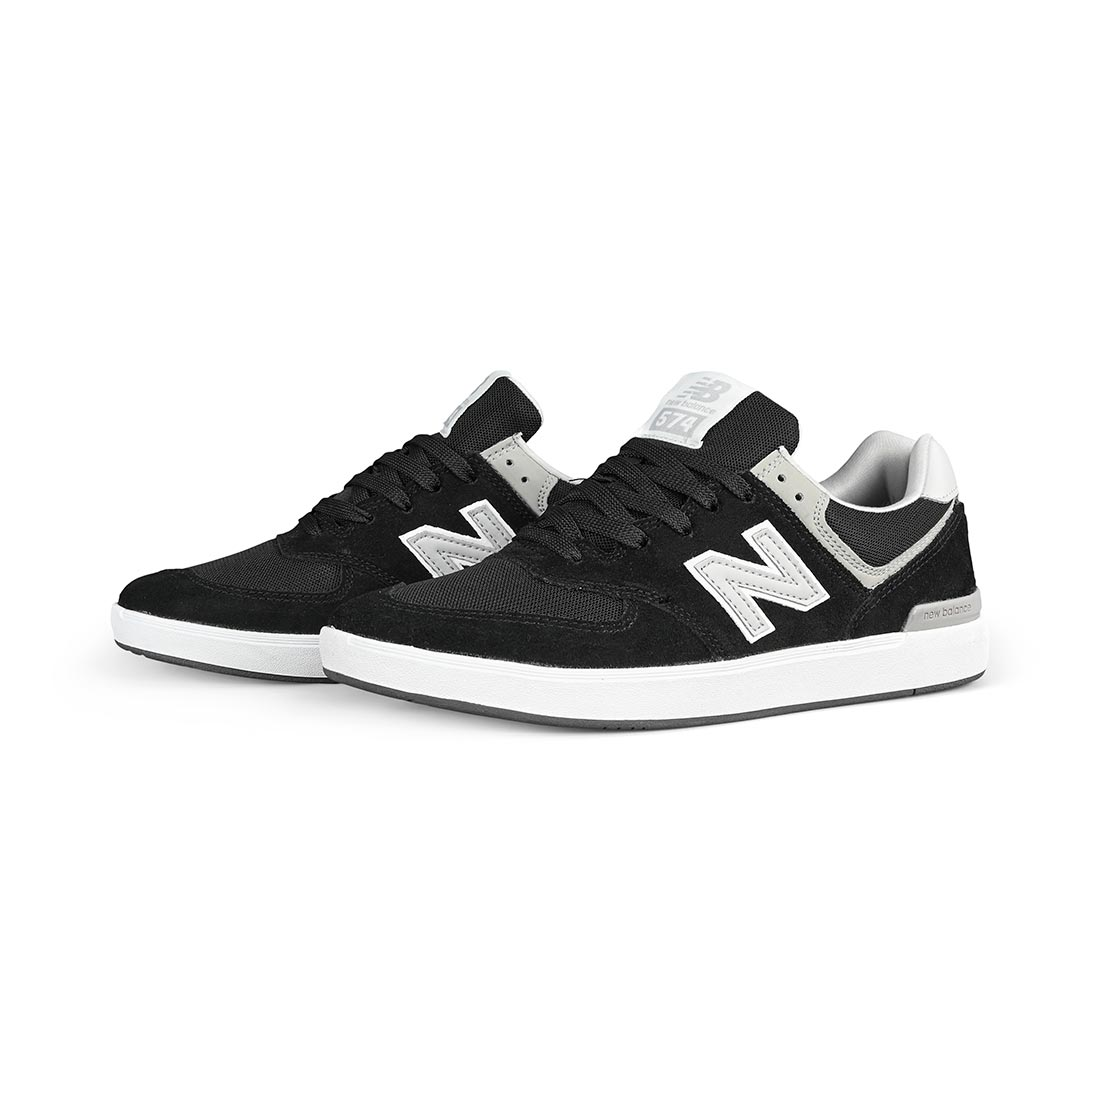 New Balance All Coasts 574 Shoes